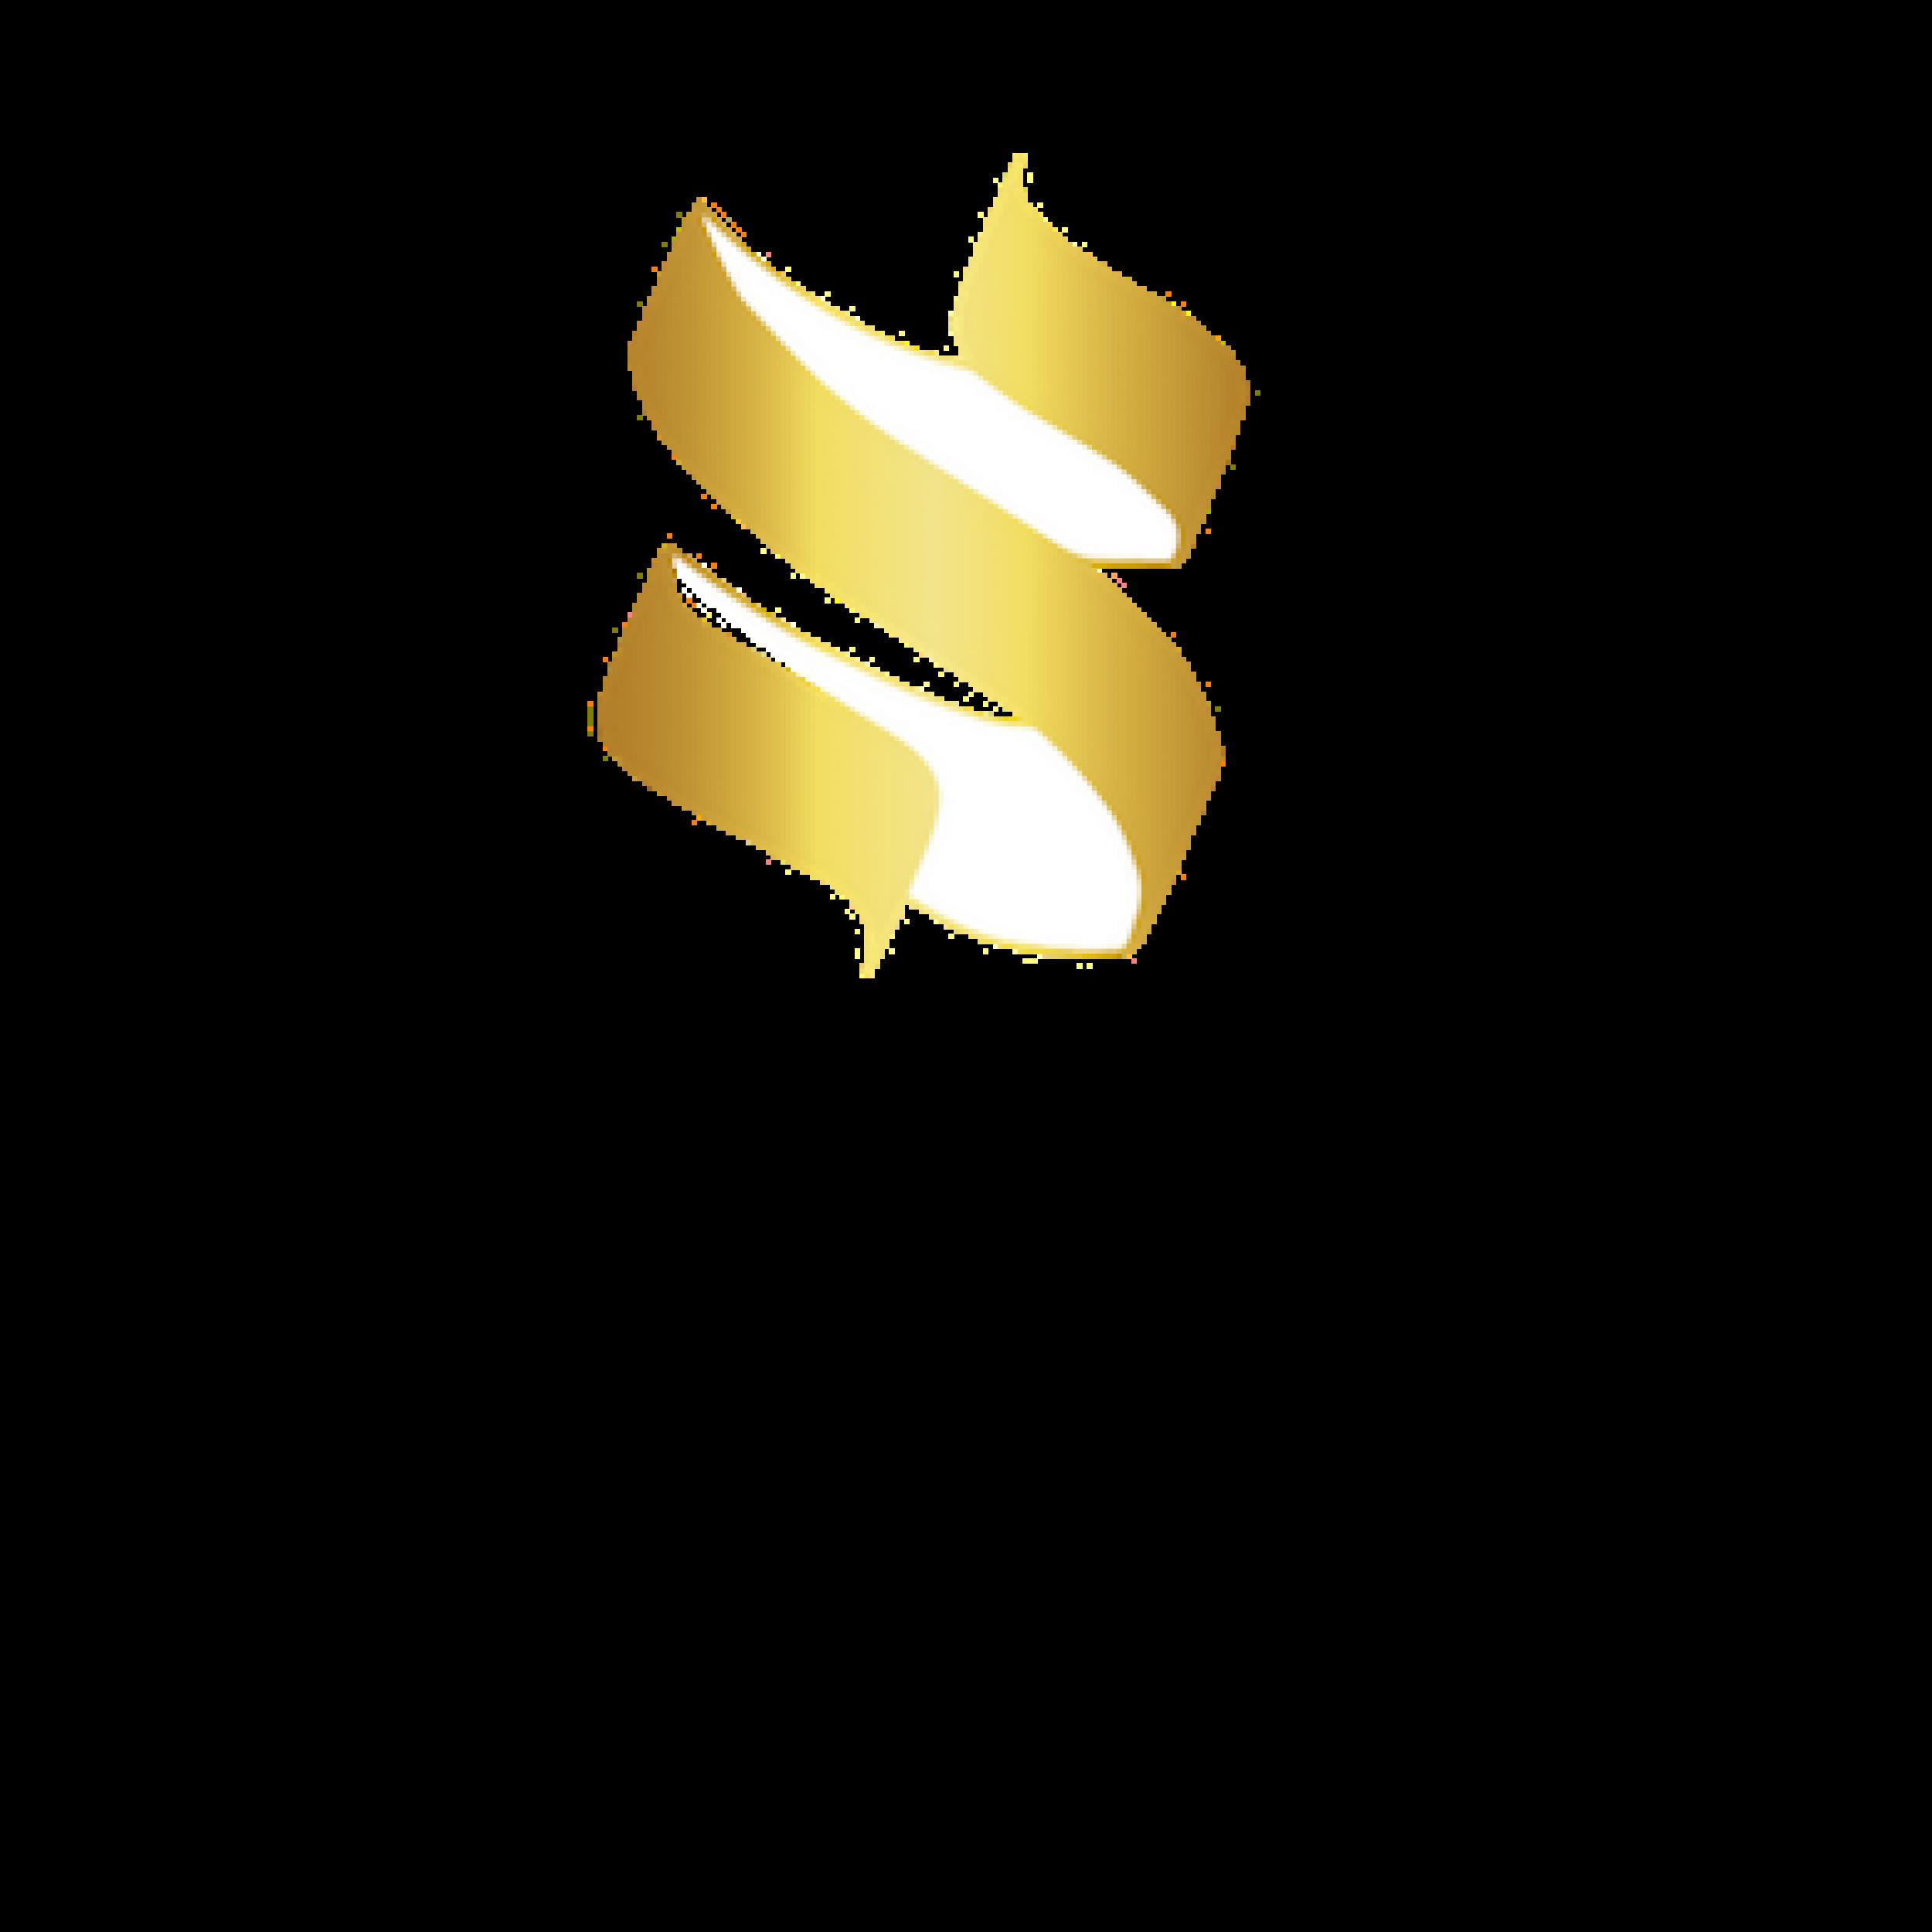 logo_stacked_justname2